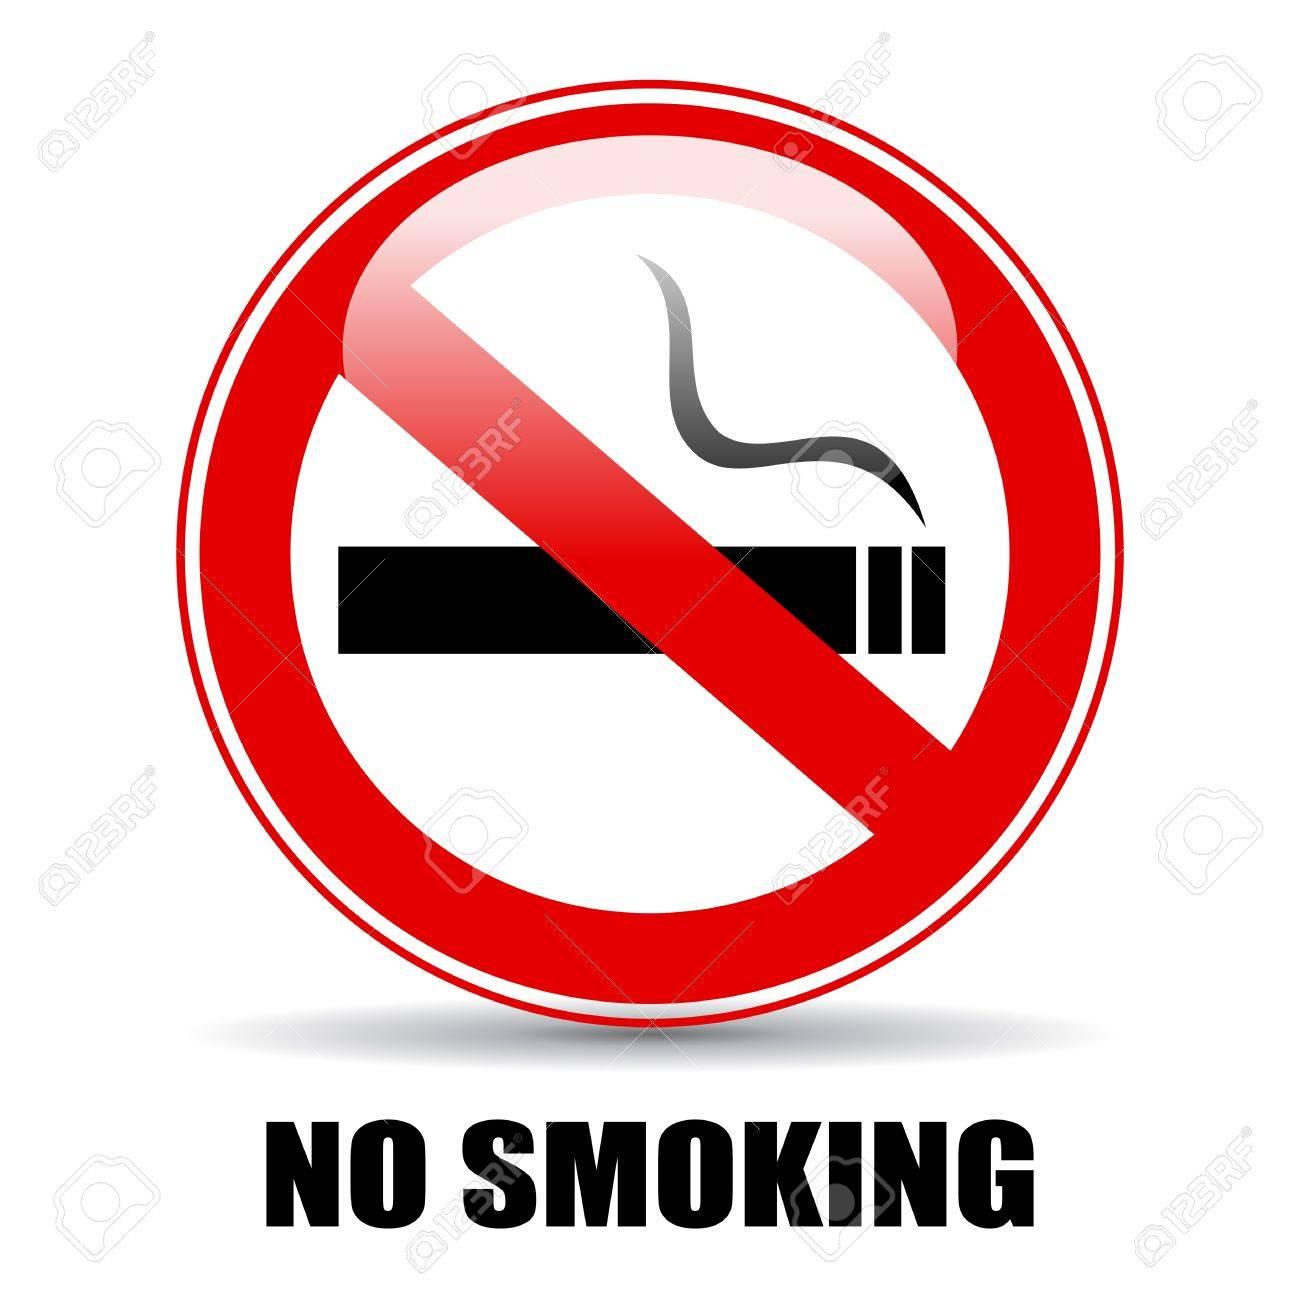 No smoking illustration Stock Vector - 22071920